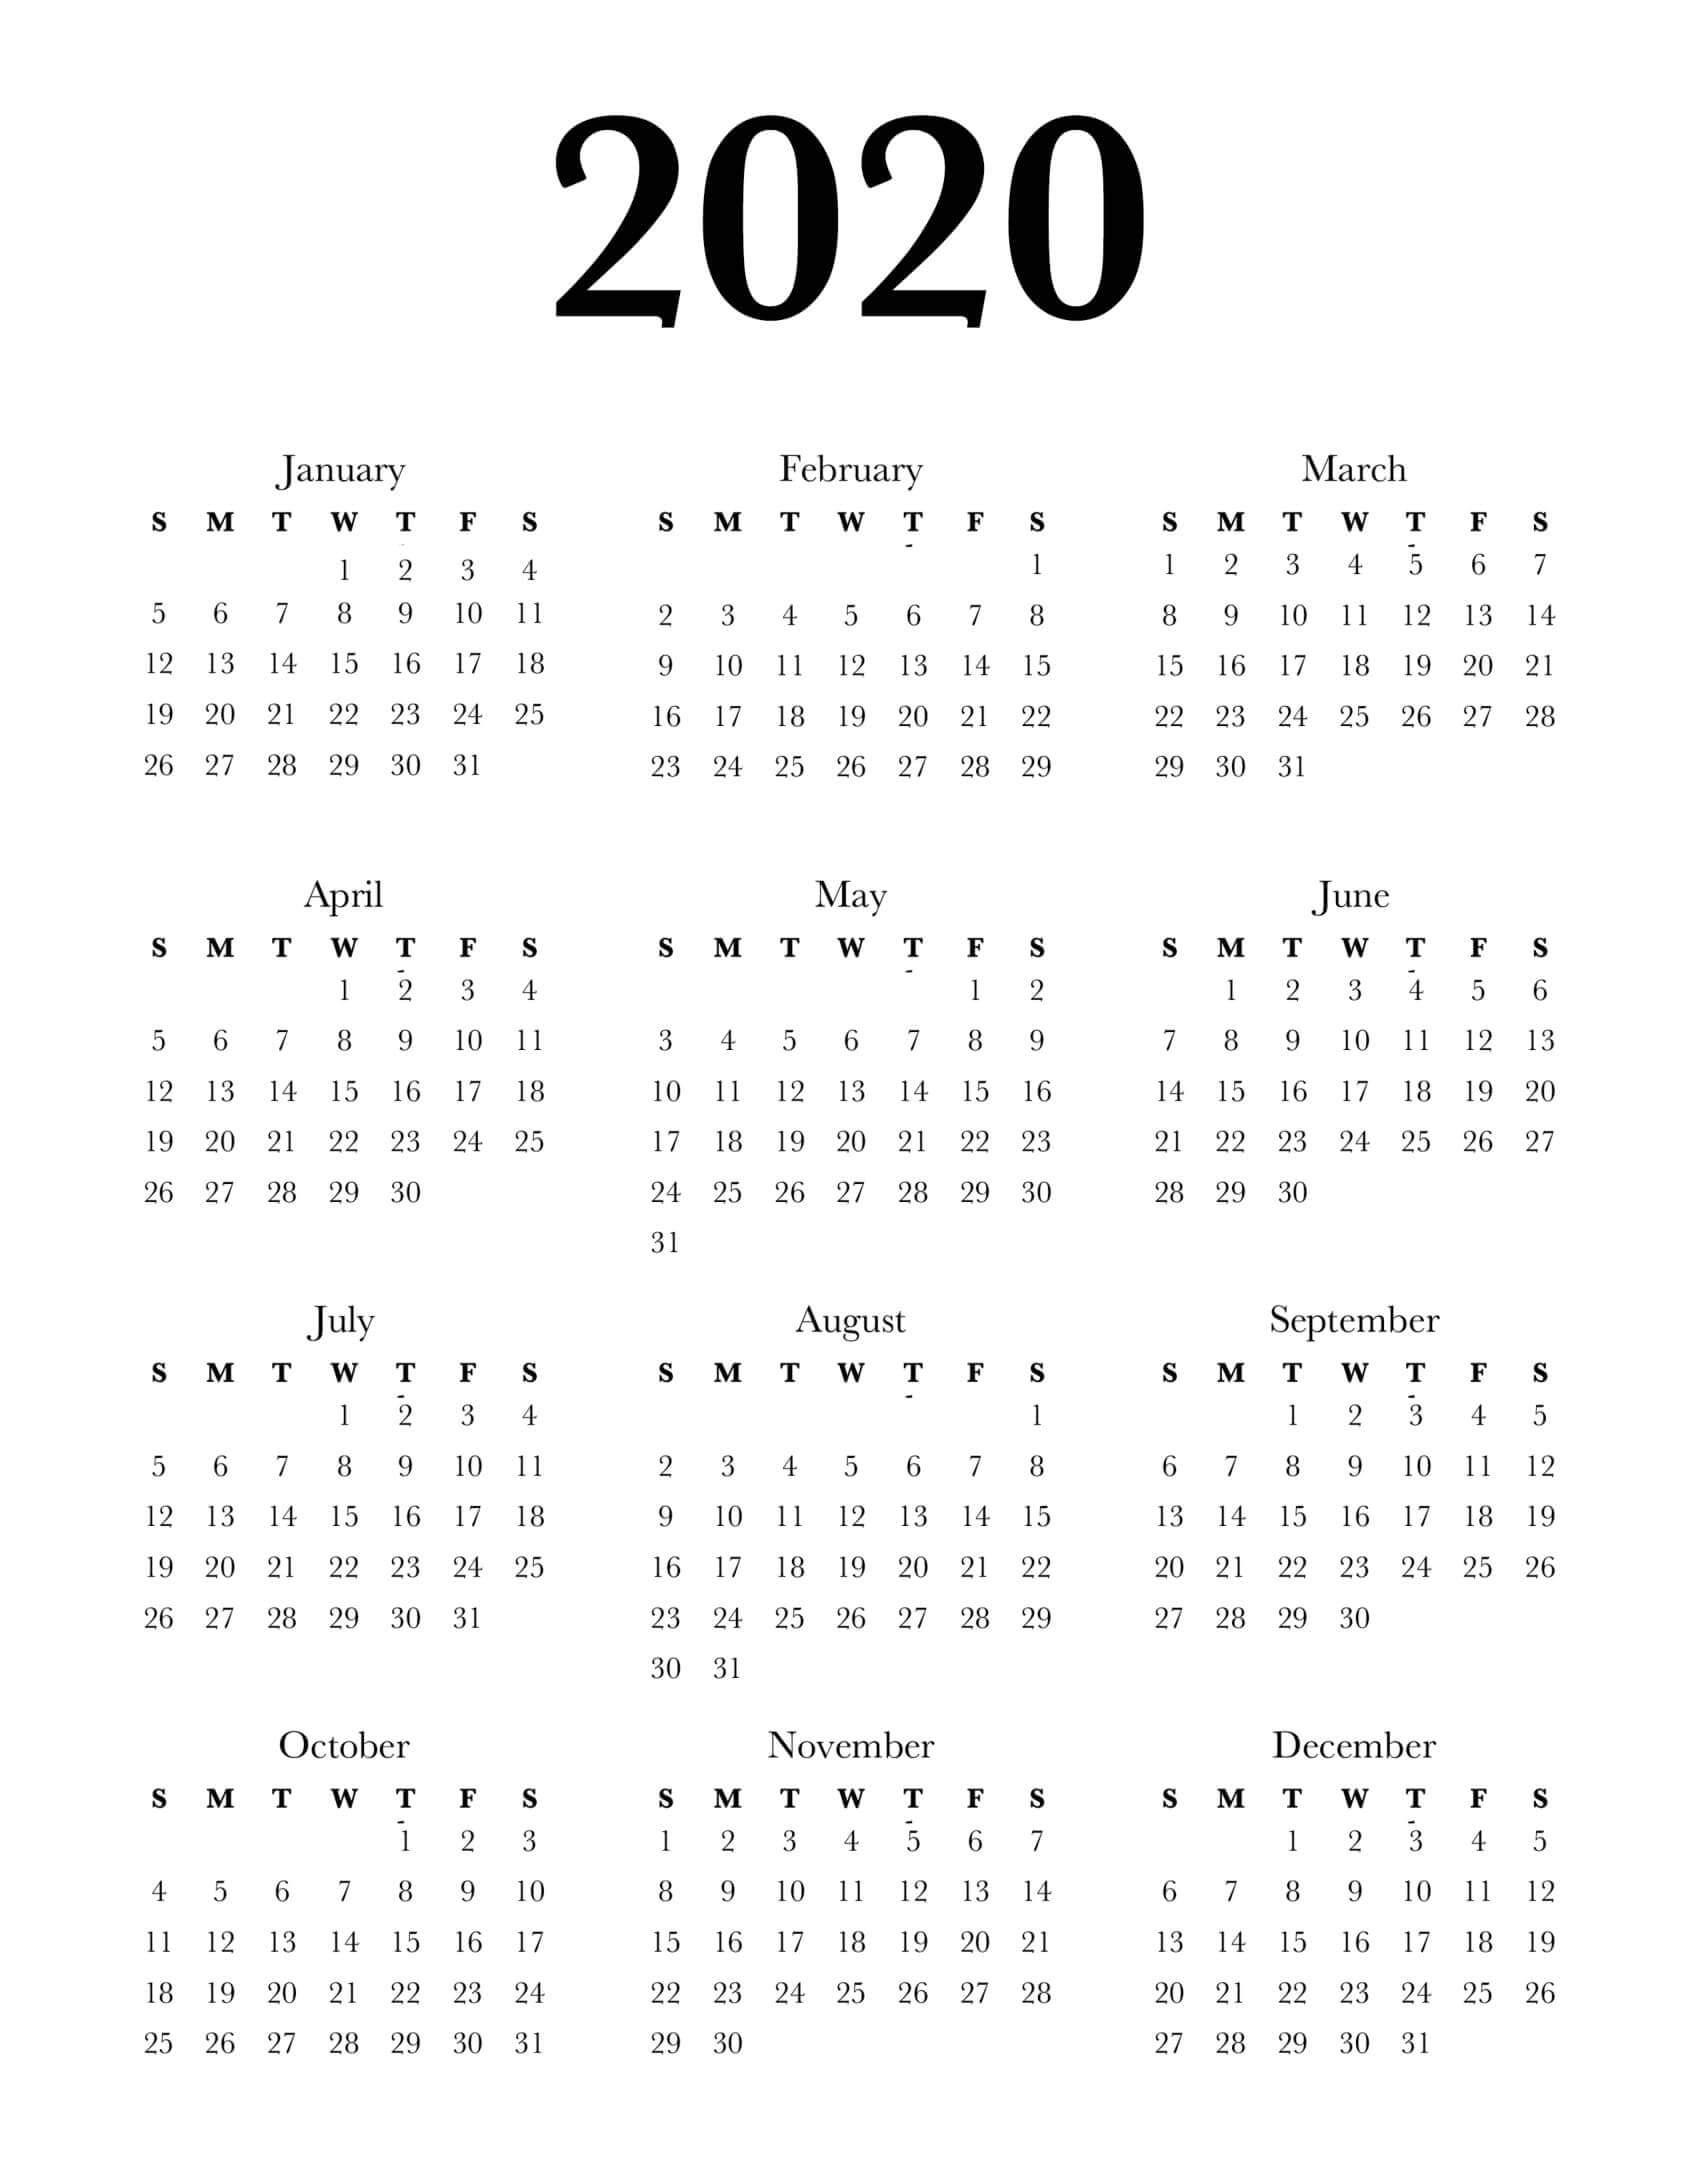 Calendar Year 2020 Holidays Template - 2019 Calendars For